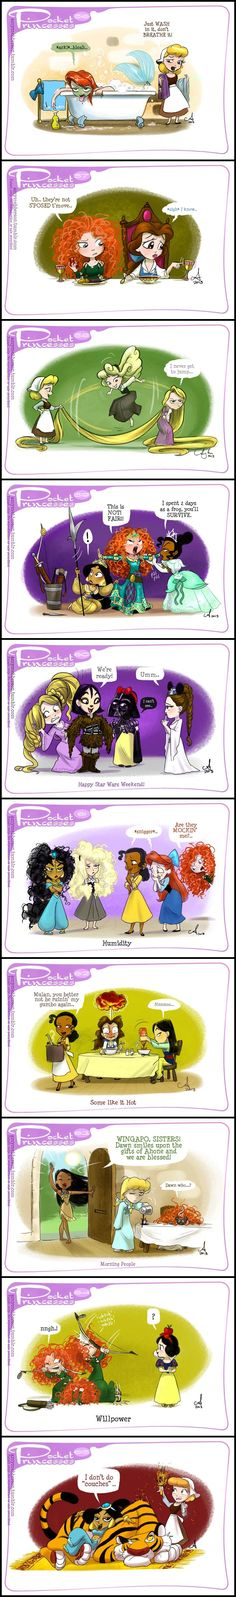 Pocket Princesses (Part 6) by Amy Mebberson